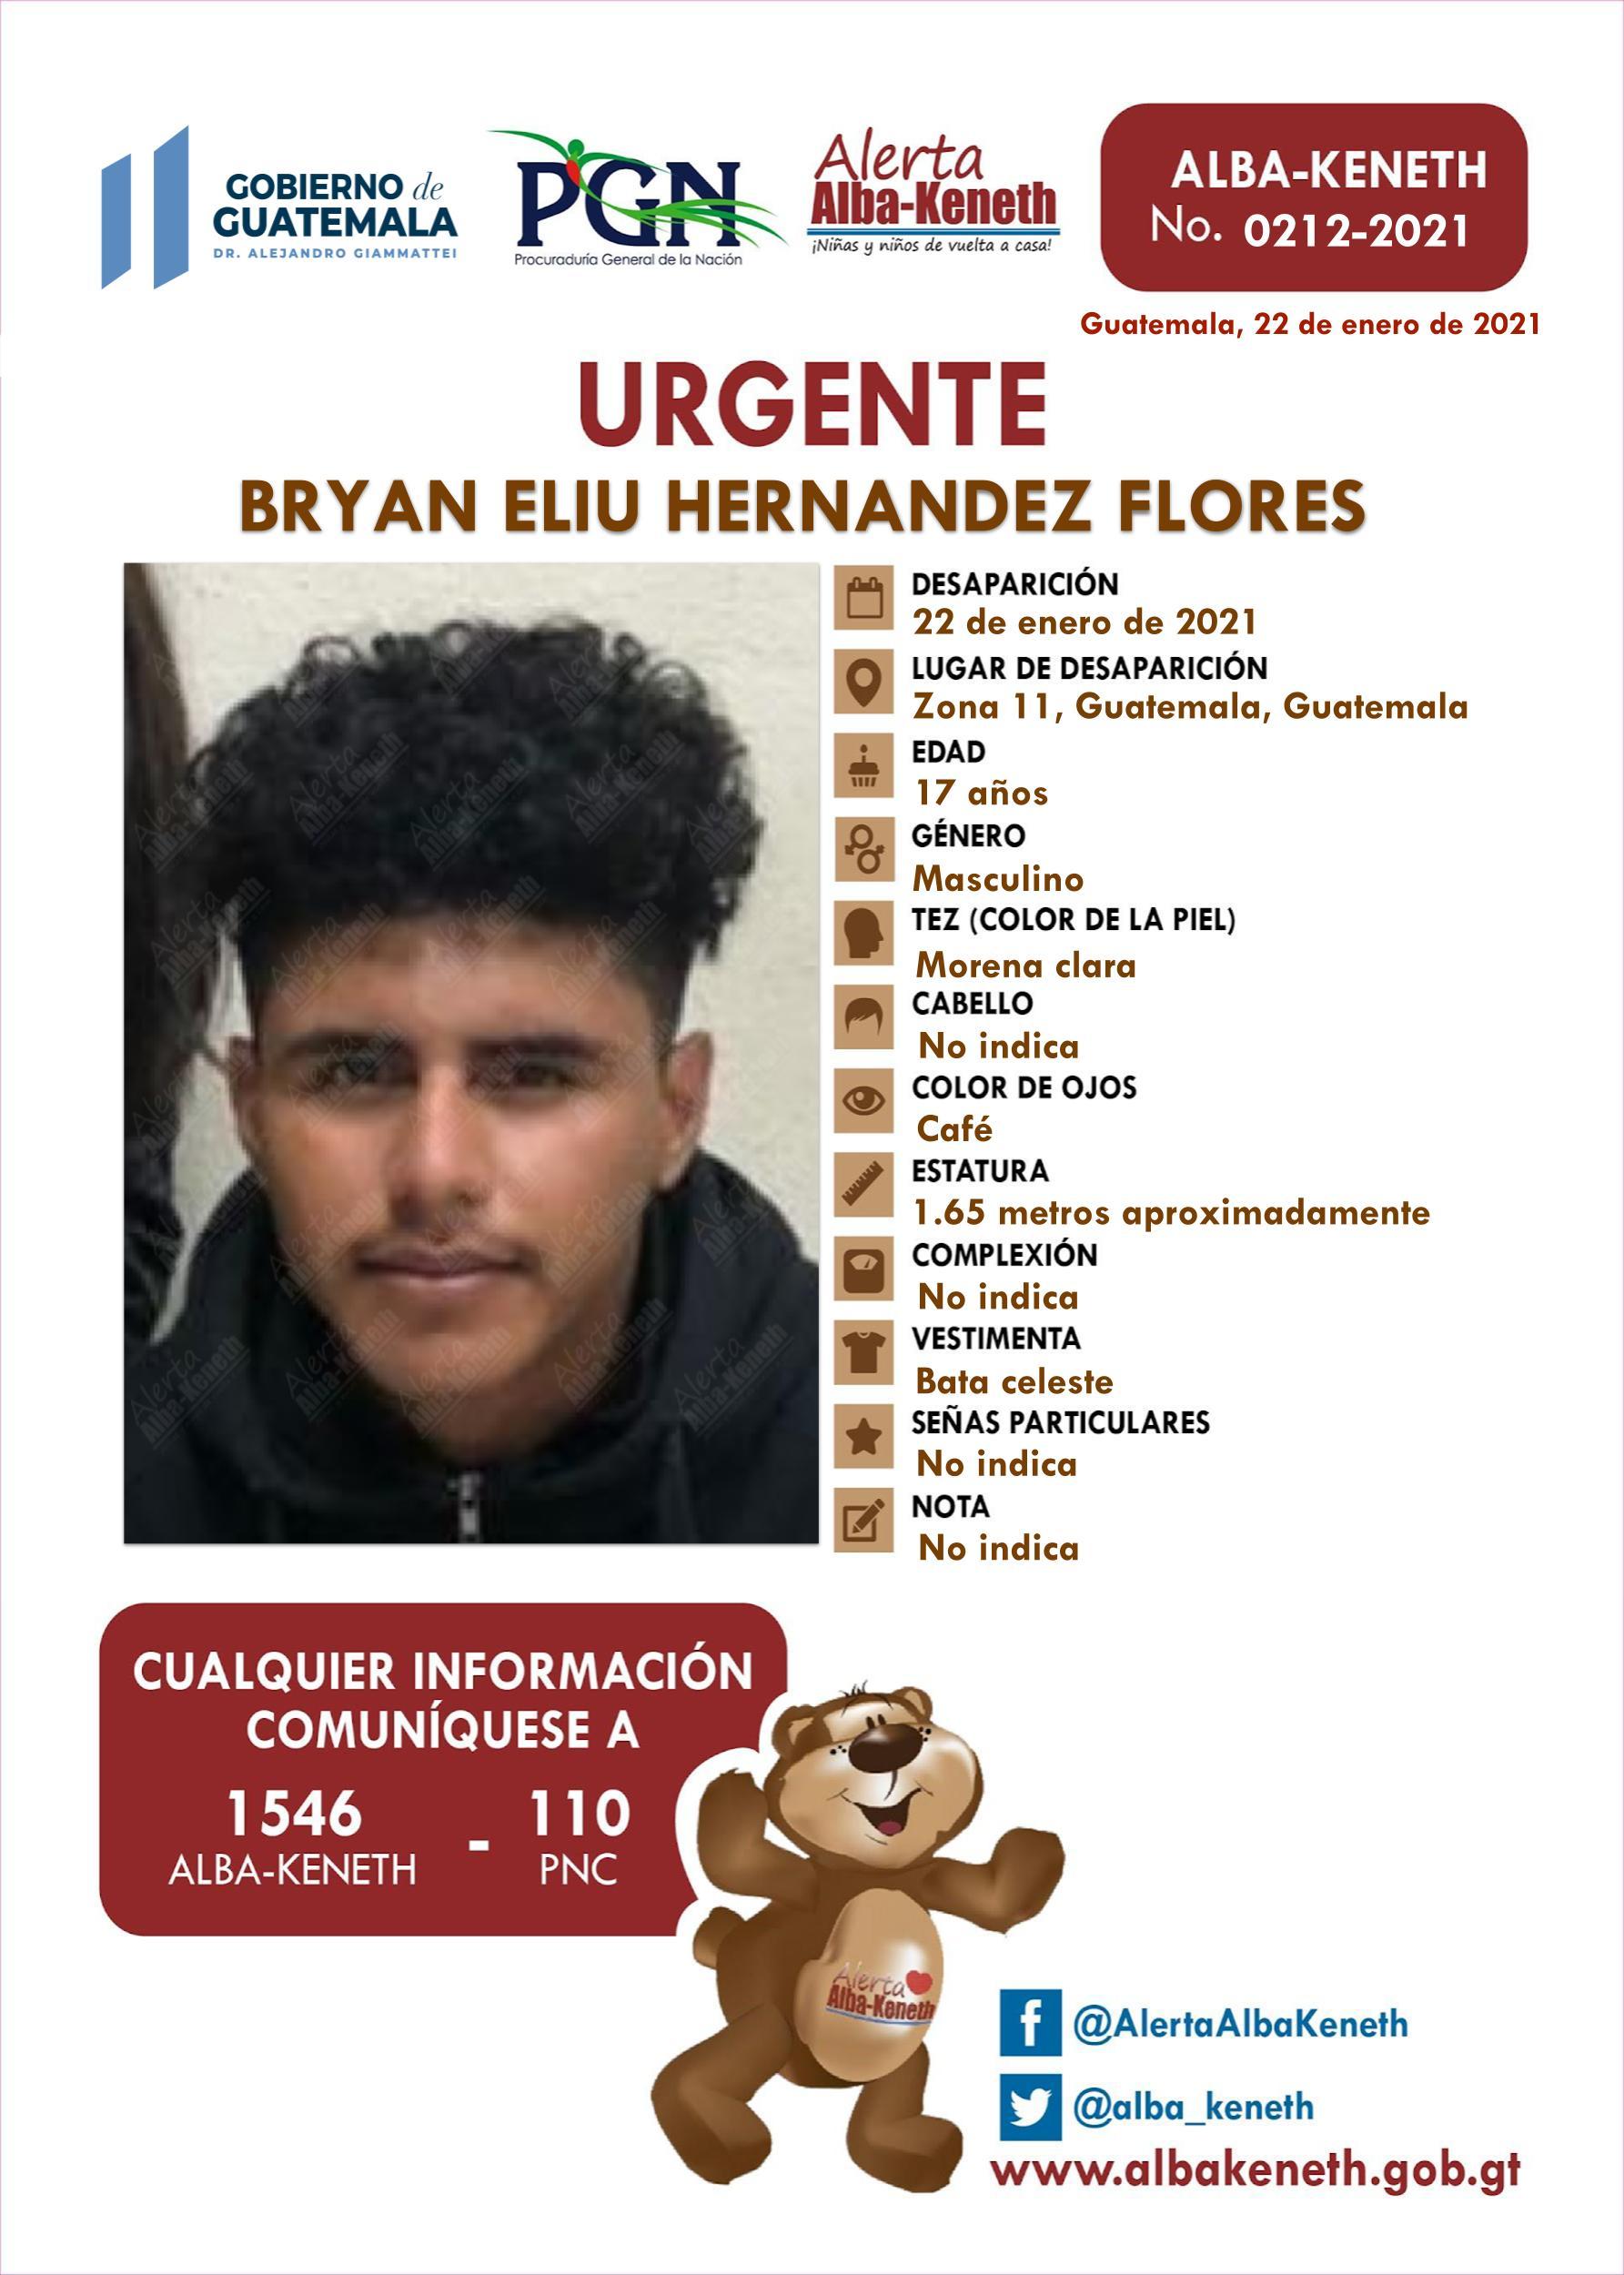 Bryan Eliu Hernández Flores